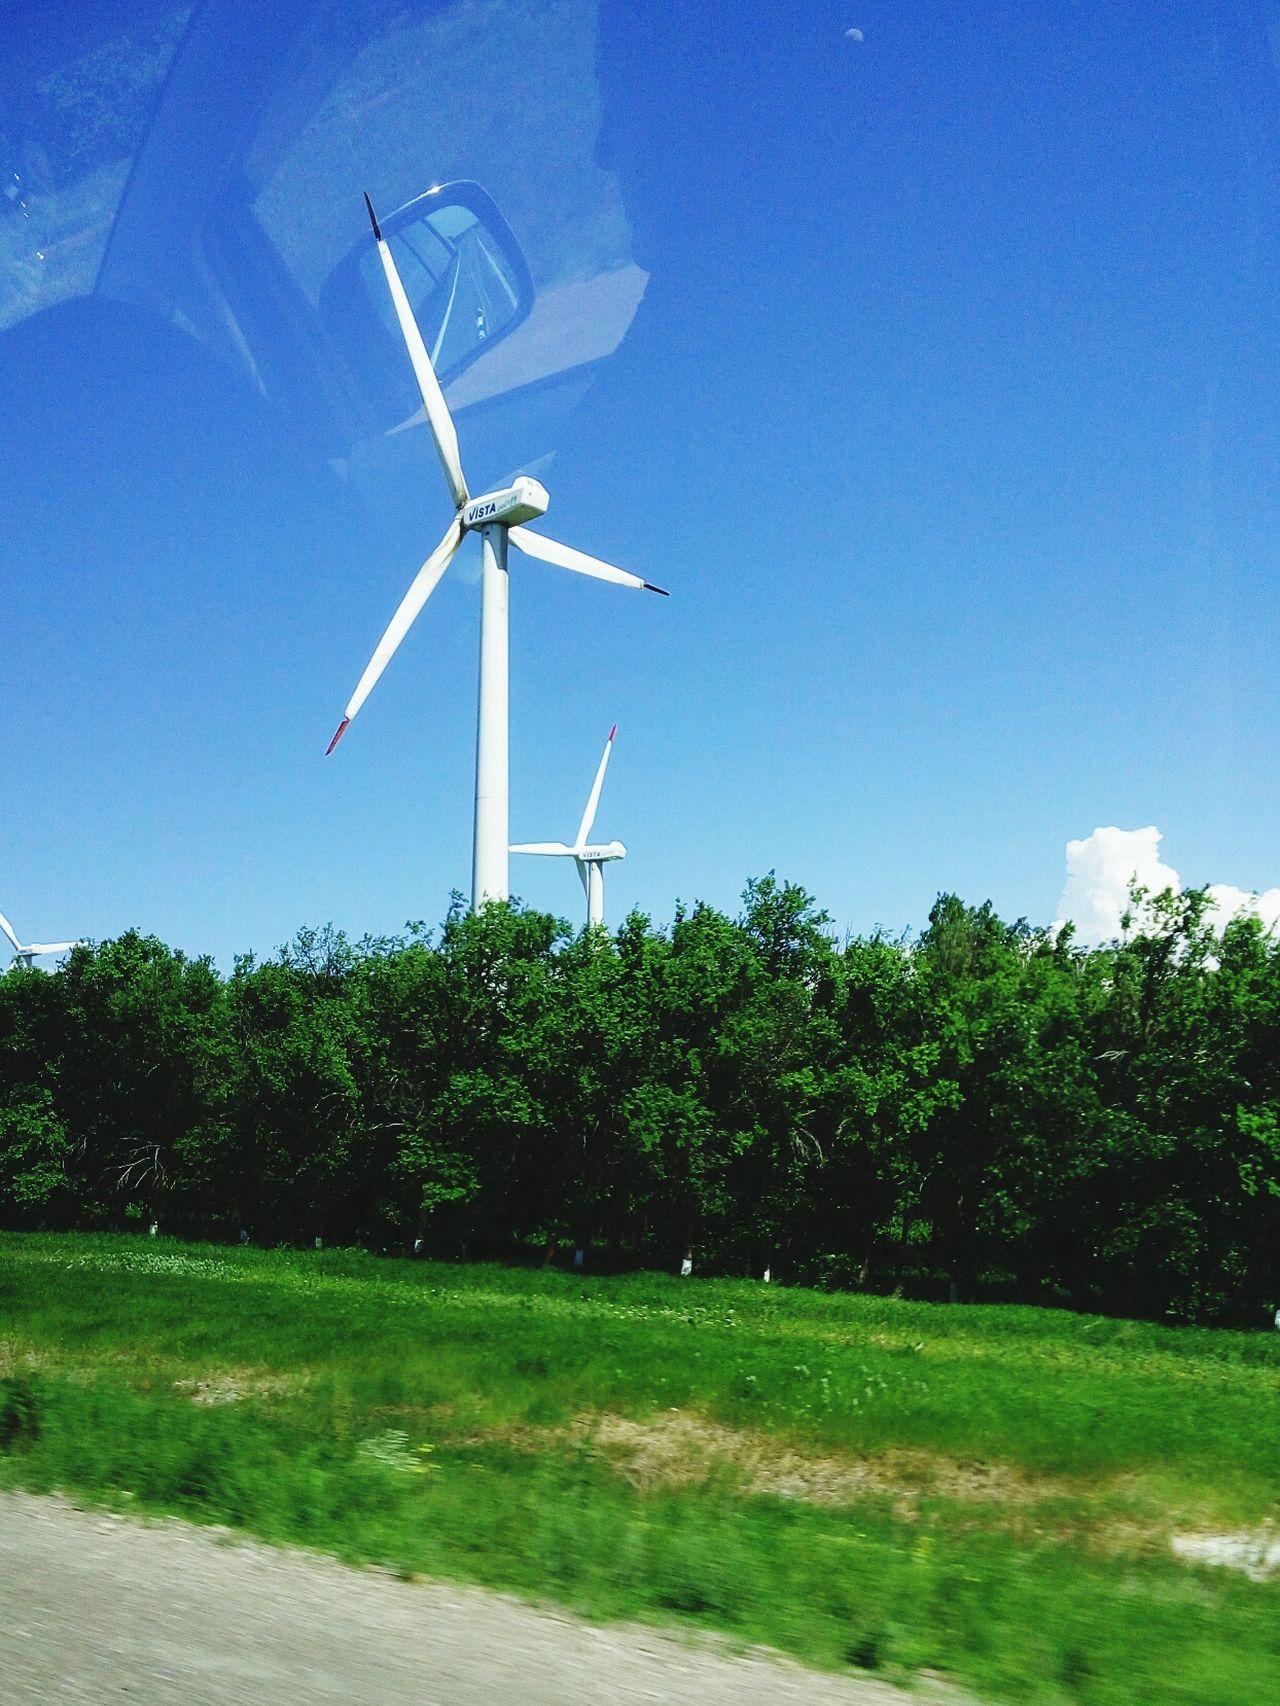 Wind Turbine Alternative Energy Wind Power Sky Day No People Clear Sky Outdoors Blue Cloud - Sky Almaty, Kazakhstan Green Color